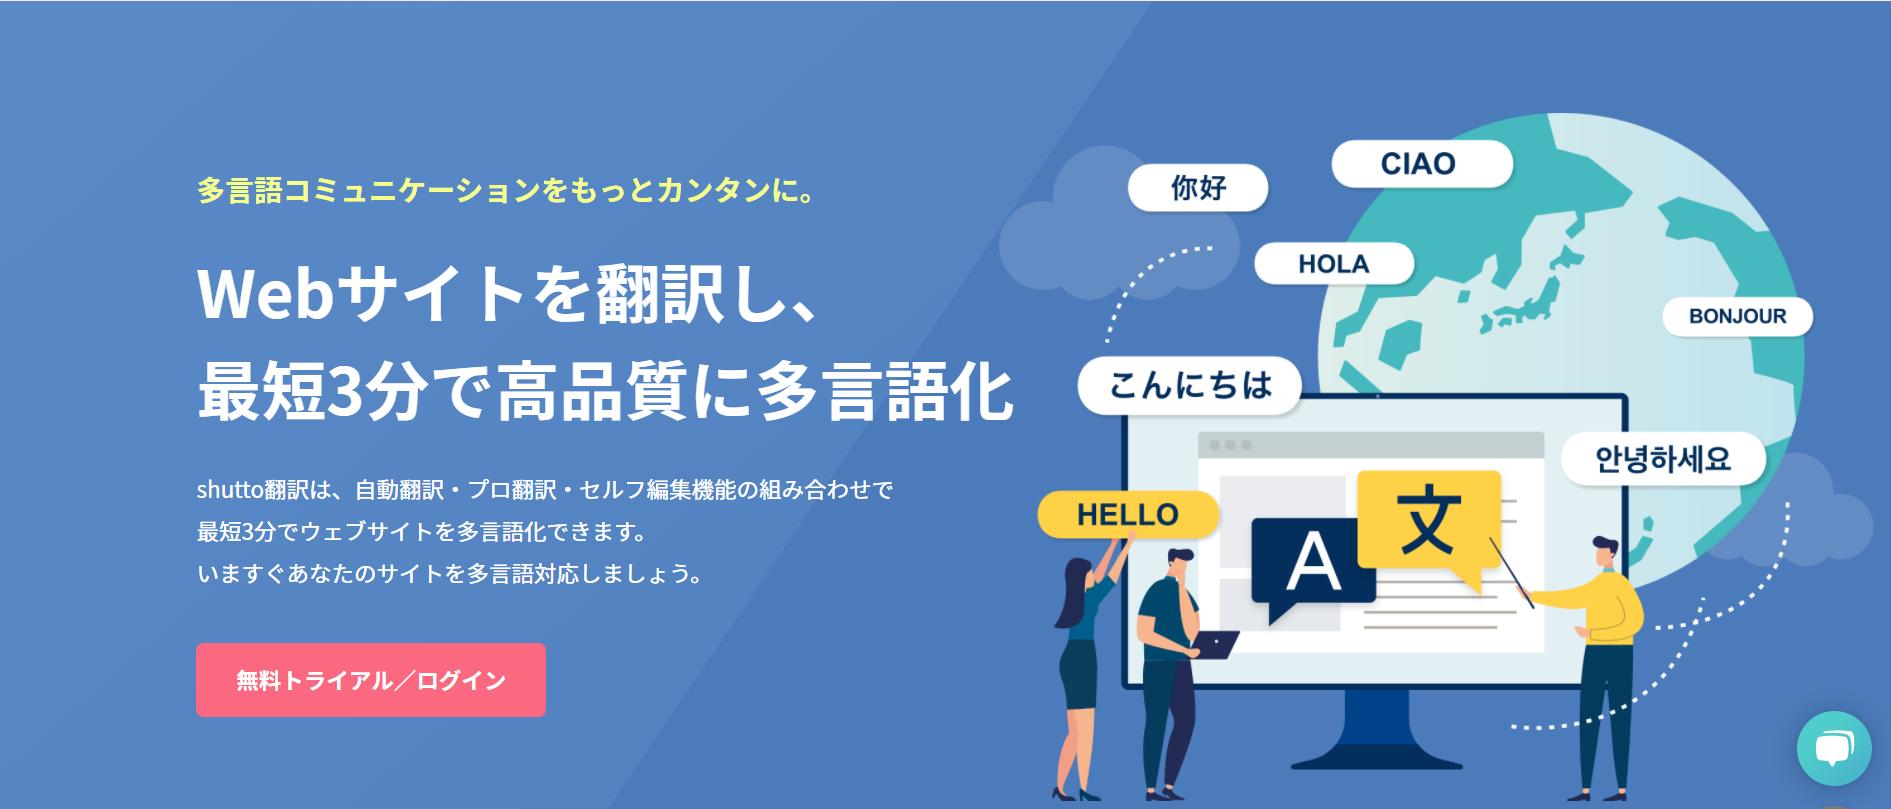 shutto翻訳公式サイトトップページ画像